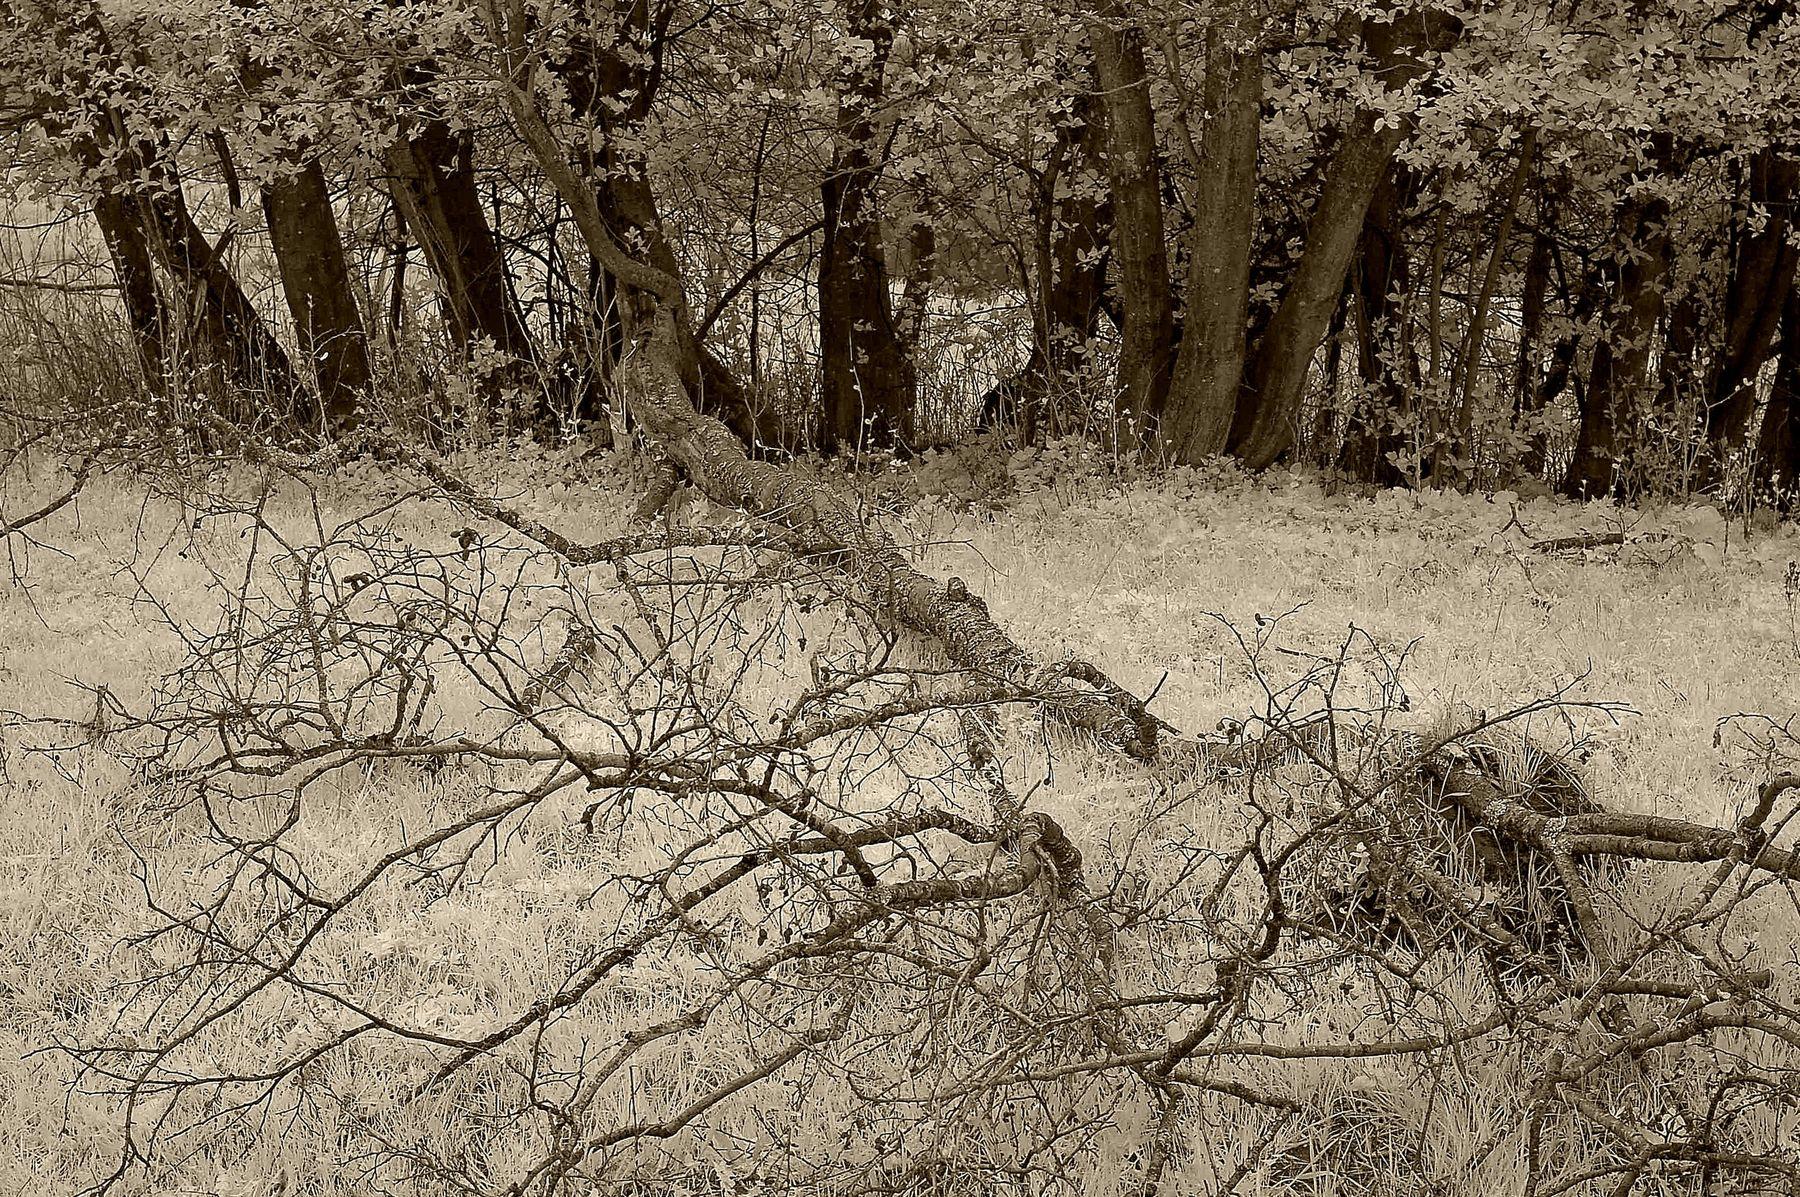 Аналог короны....Ярославская губерния.Р.Ф.  2020 г. от Р.Х. Монохромная инфракрасная фотография. Инфракрасная фотография